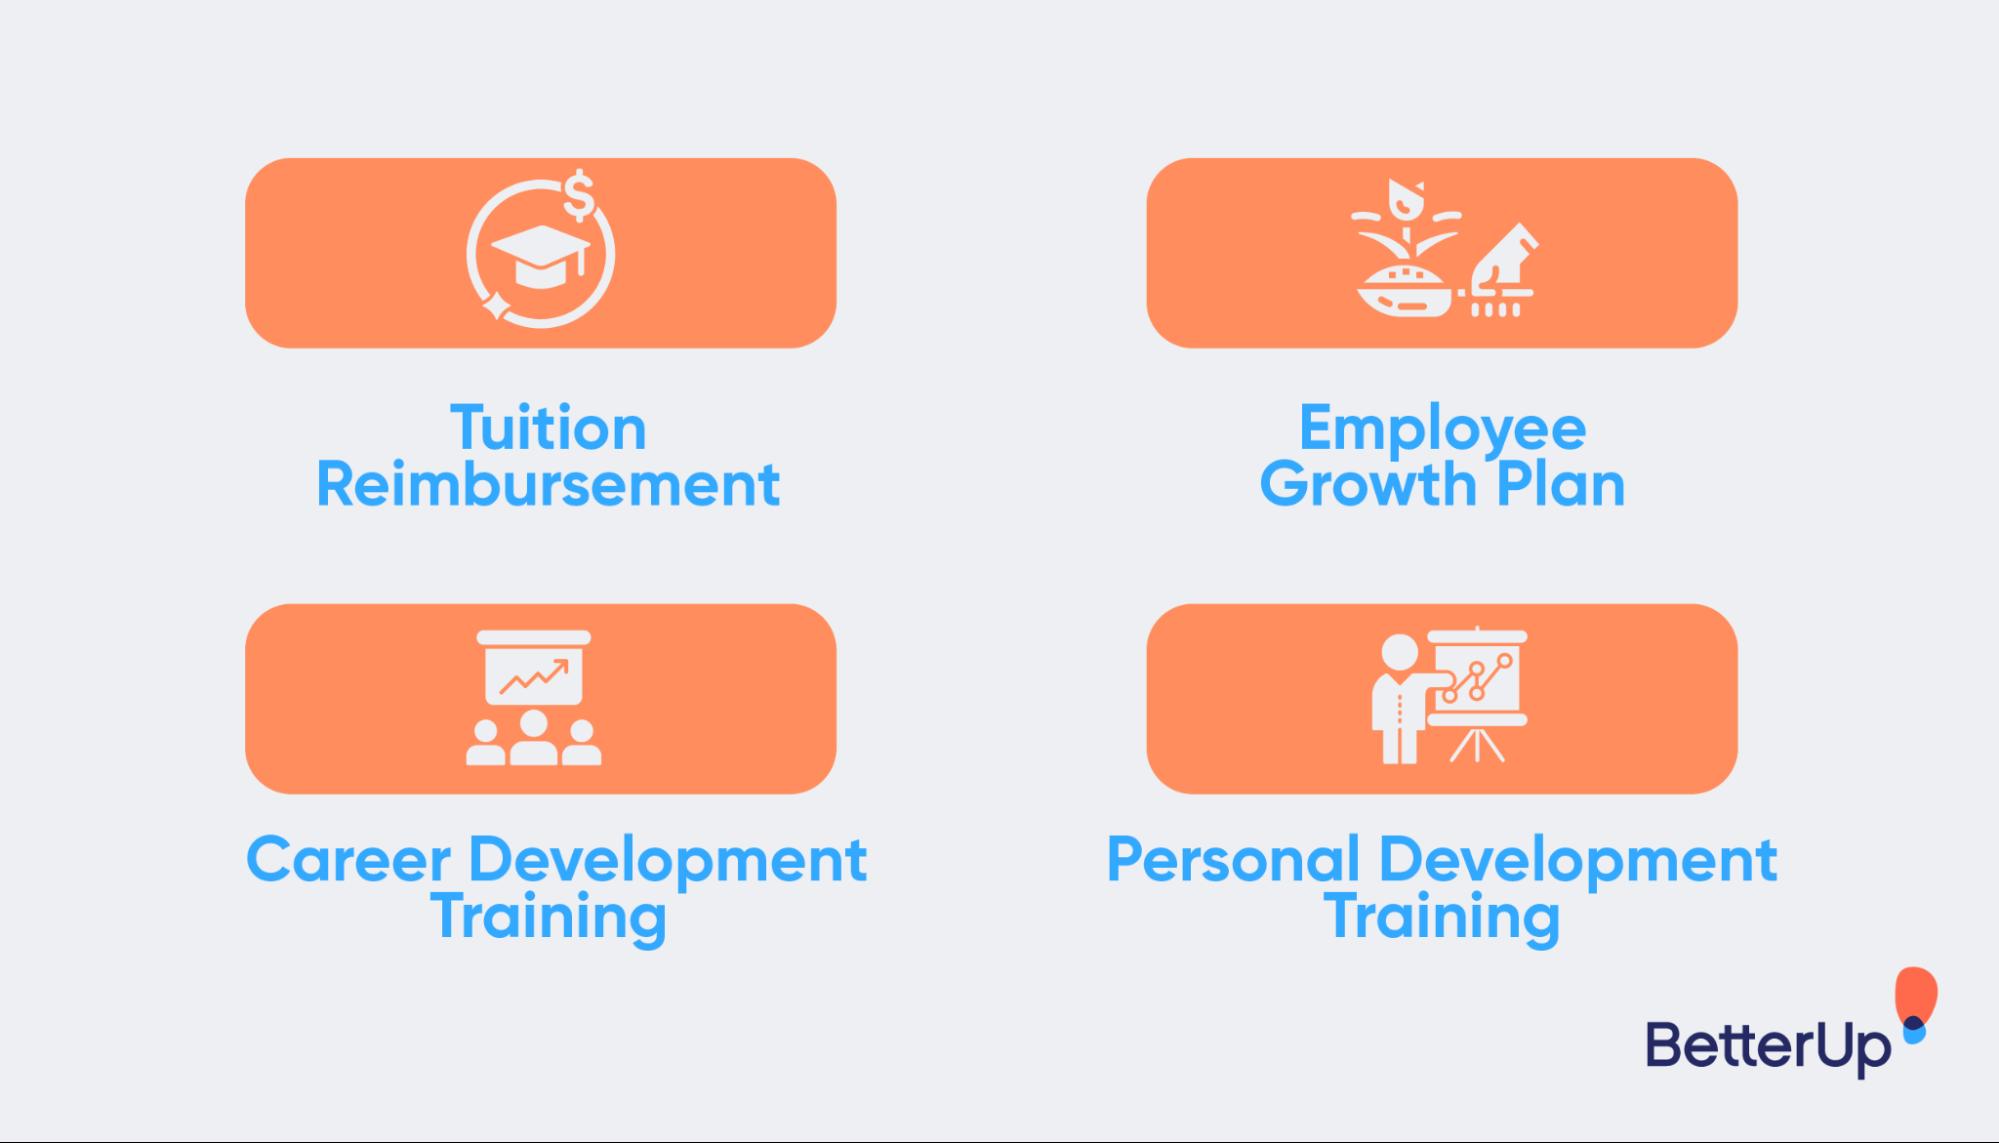 education-benefits-best-job-benefits